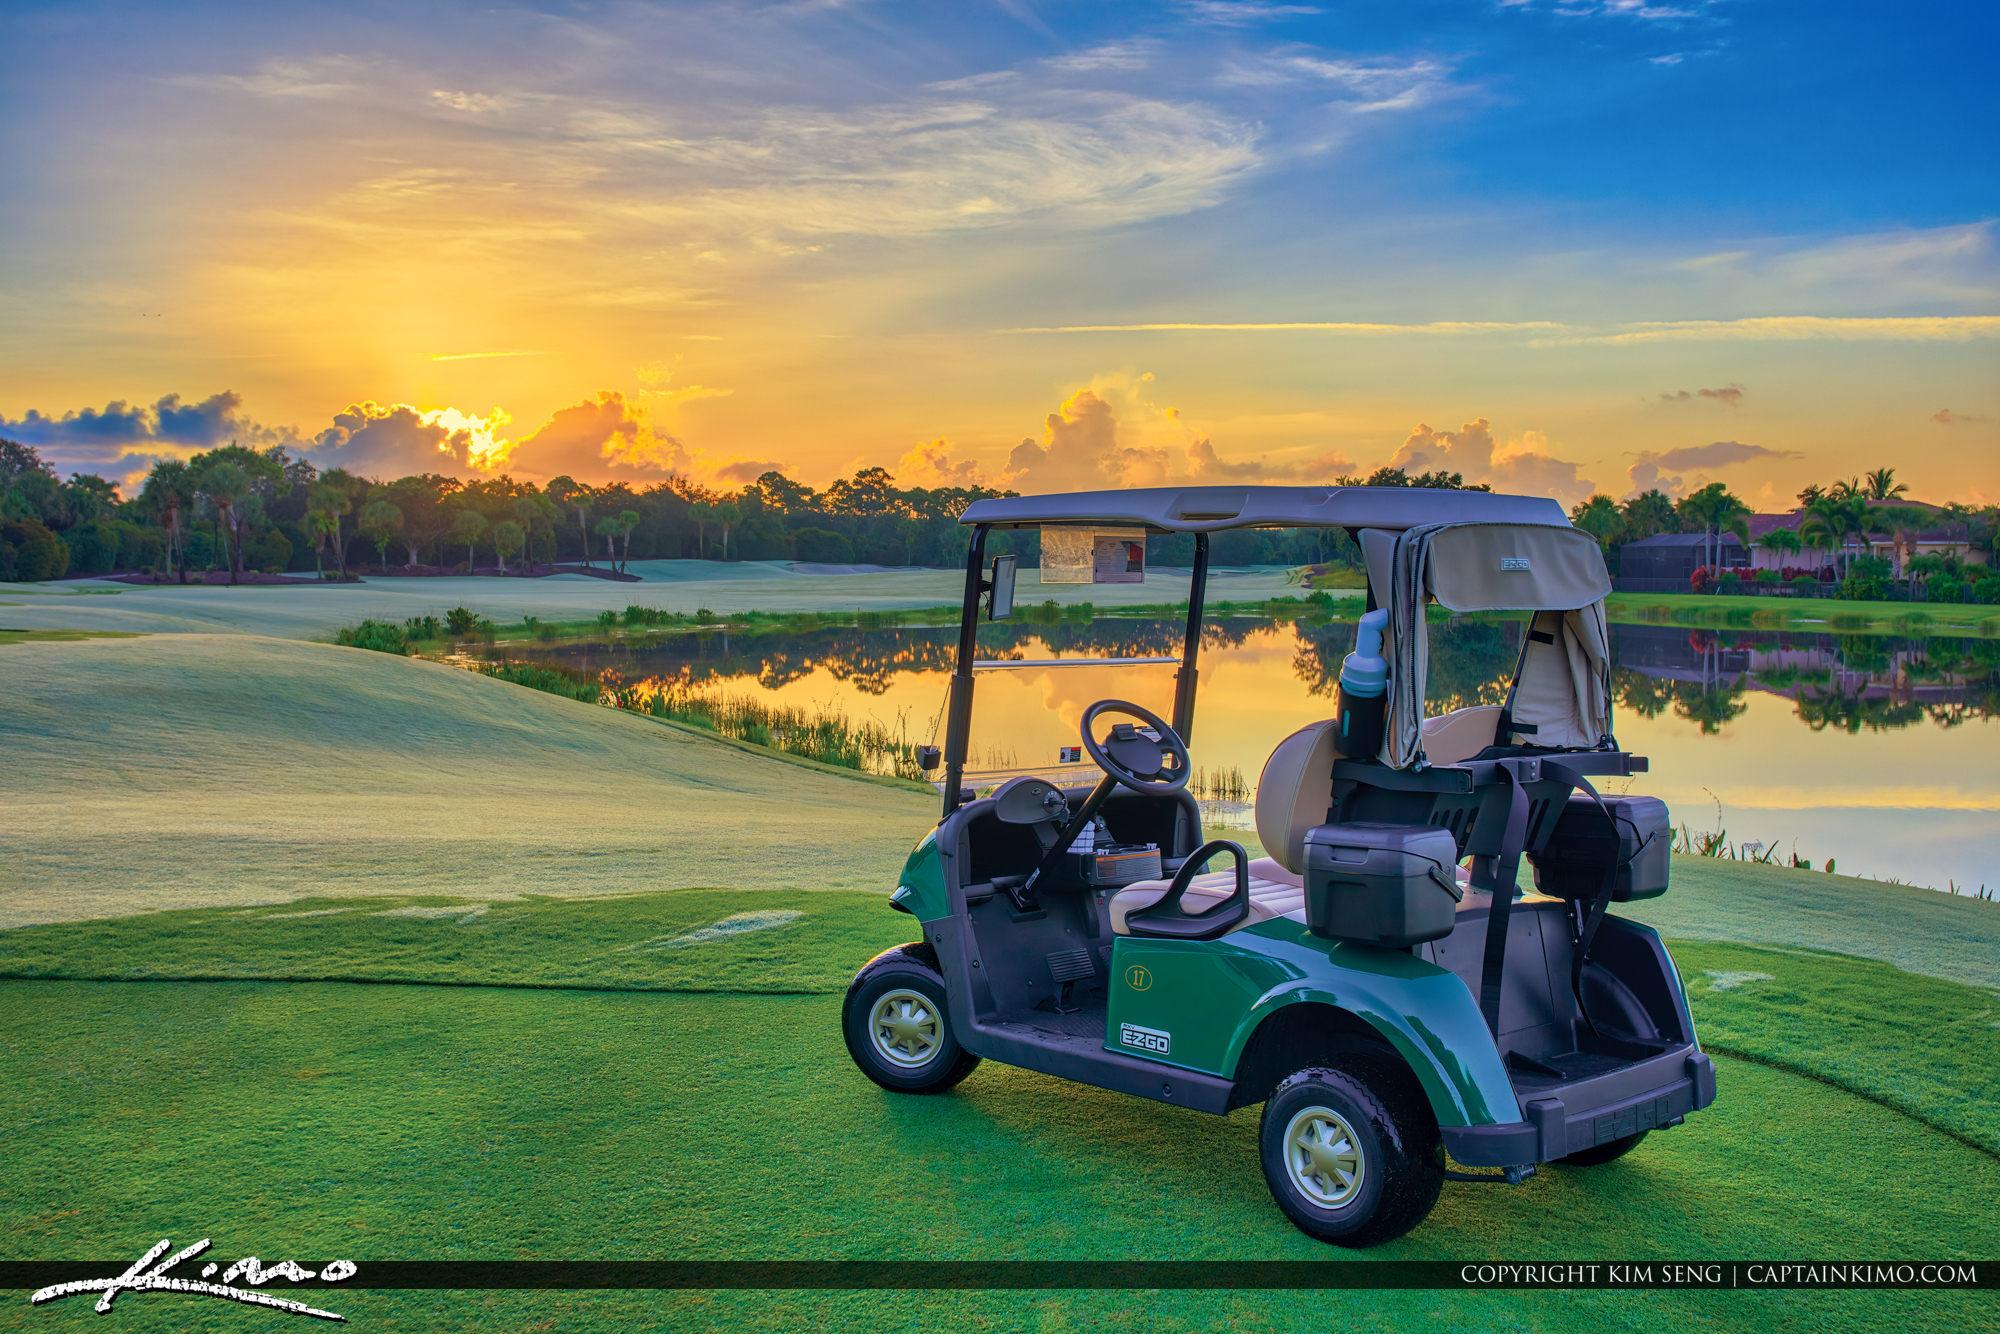 EZ Go Golf Cart at Mirasol Golf Course Sunrise in Palm Beach Gardens